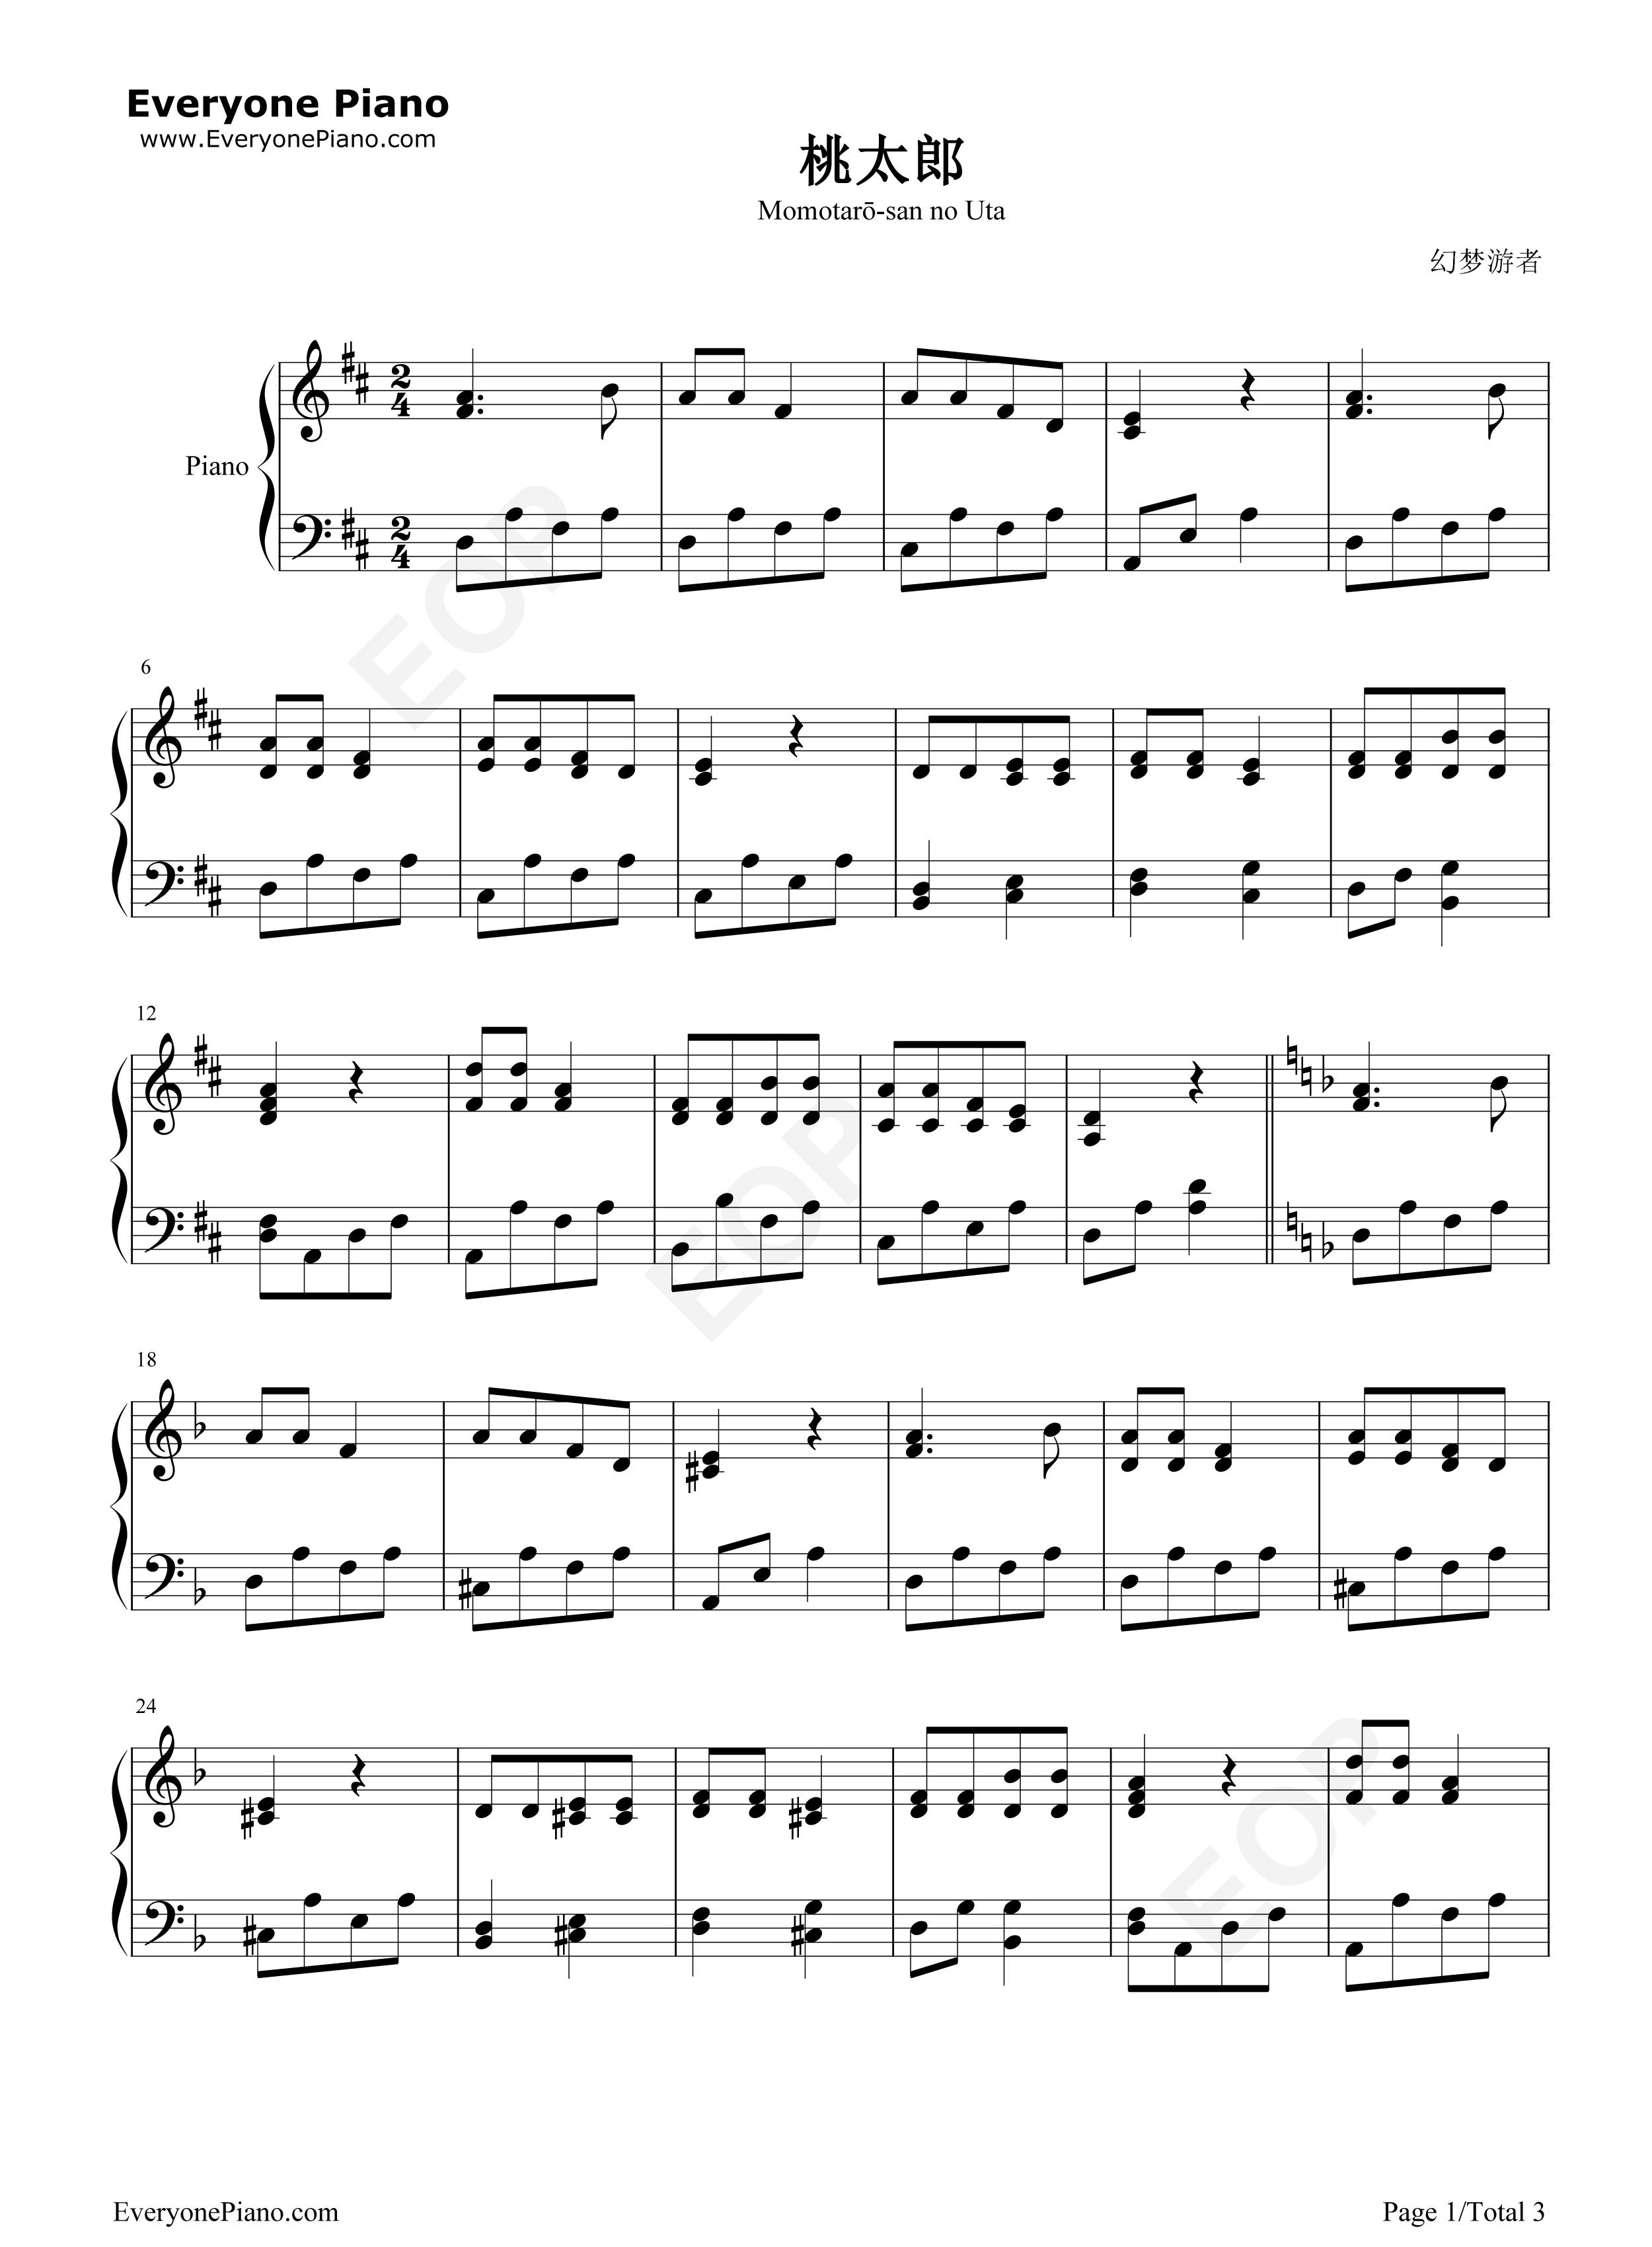 Momotarō-san no Uta-Momotarō's Song Stave Preview 1